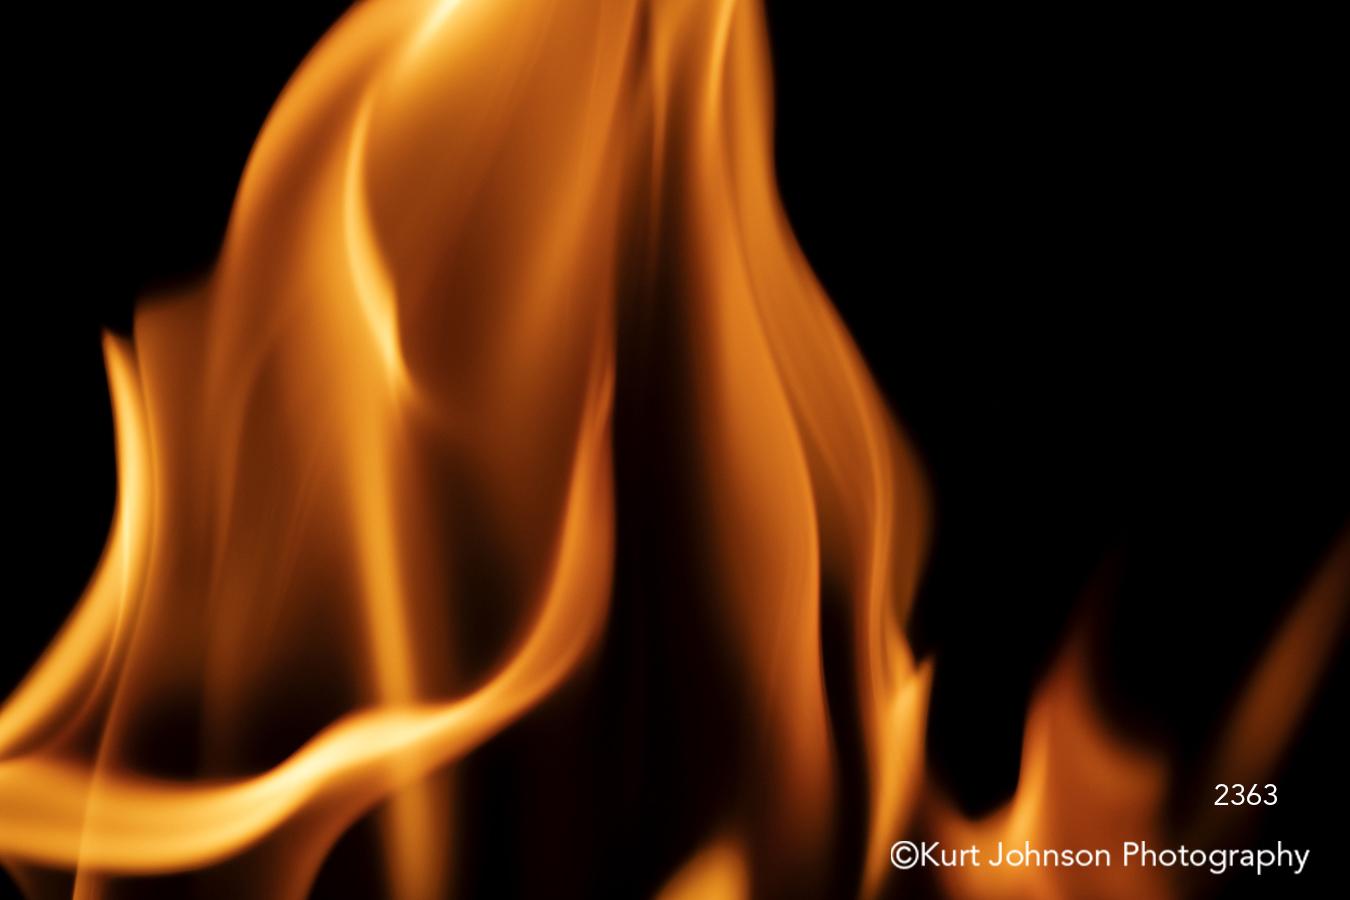 orange fire flame pattern texture close up textures black detail natural element